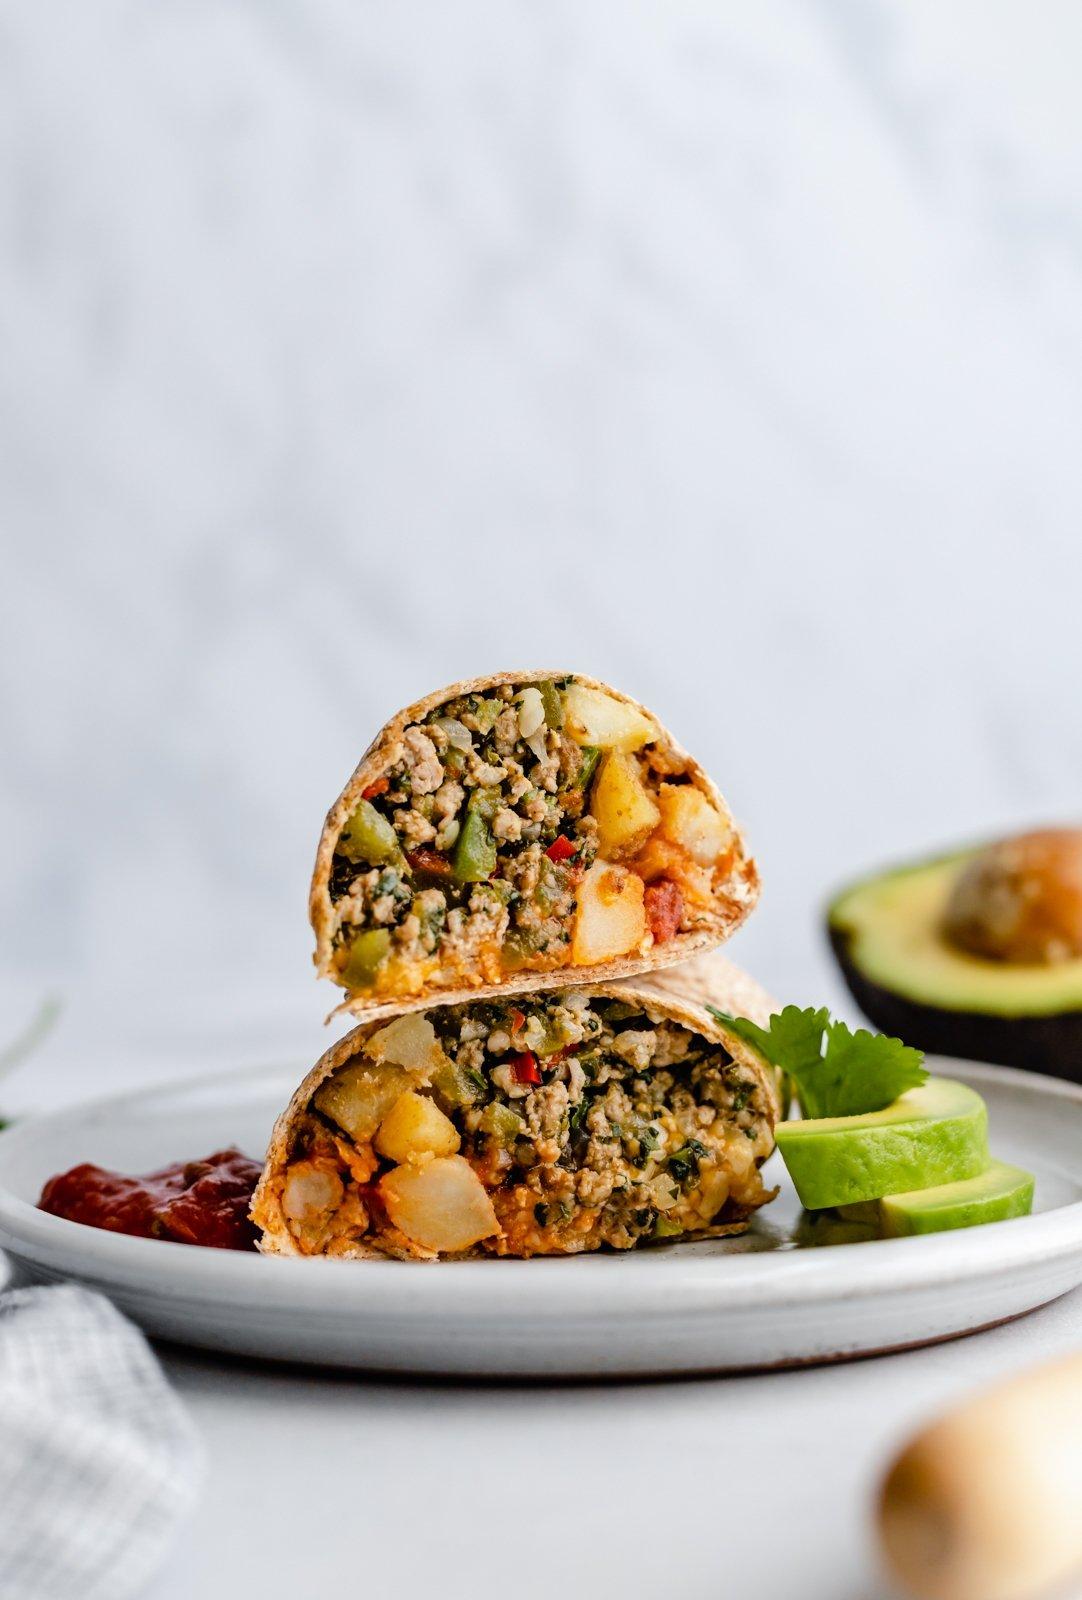 freezer-friendly green chile chicken burrito on a plate